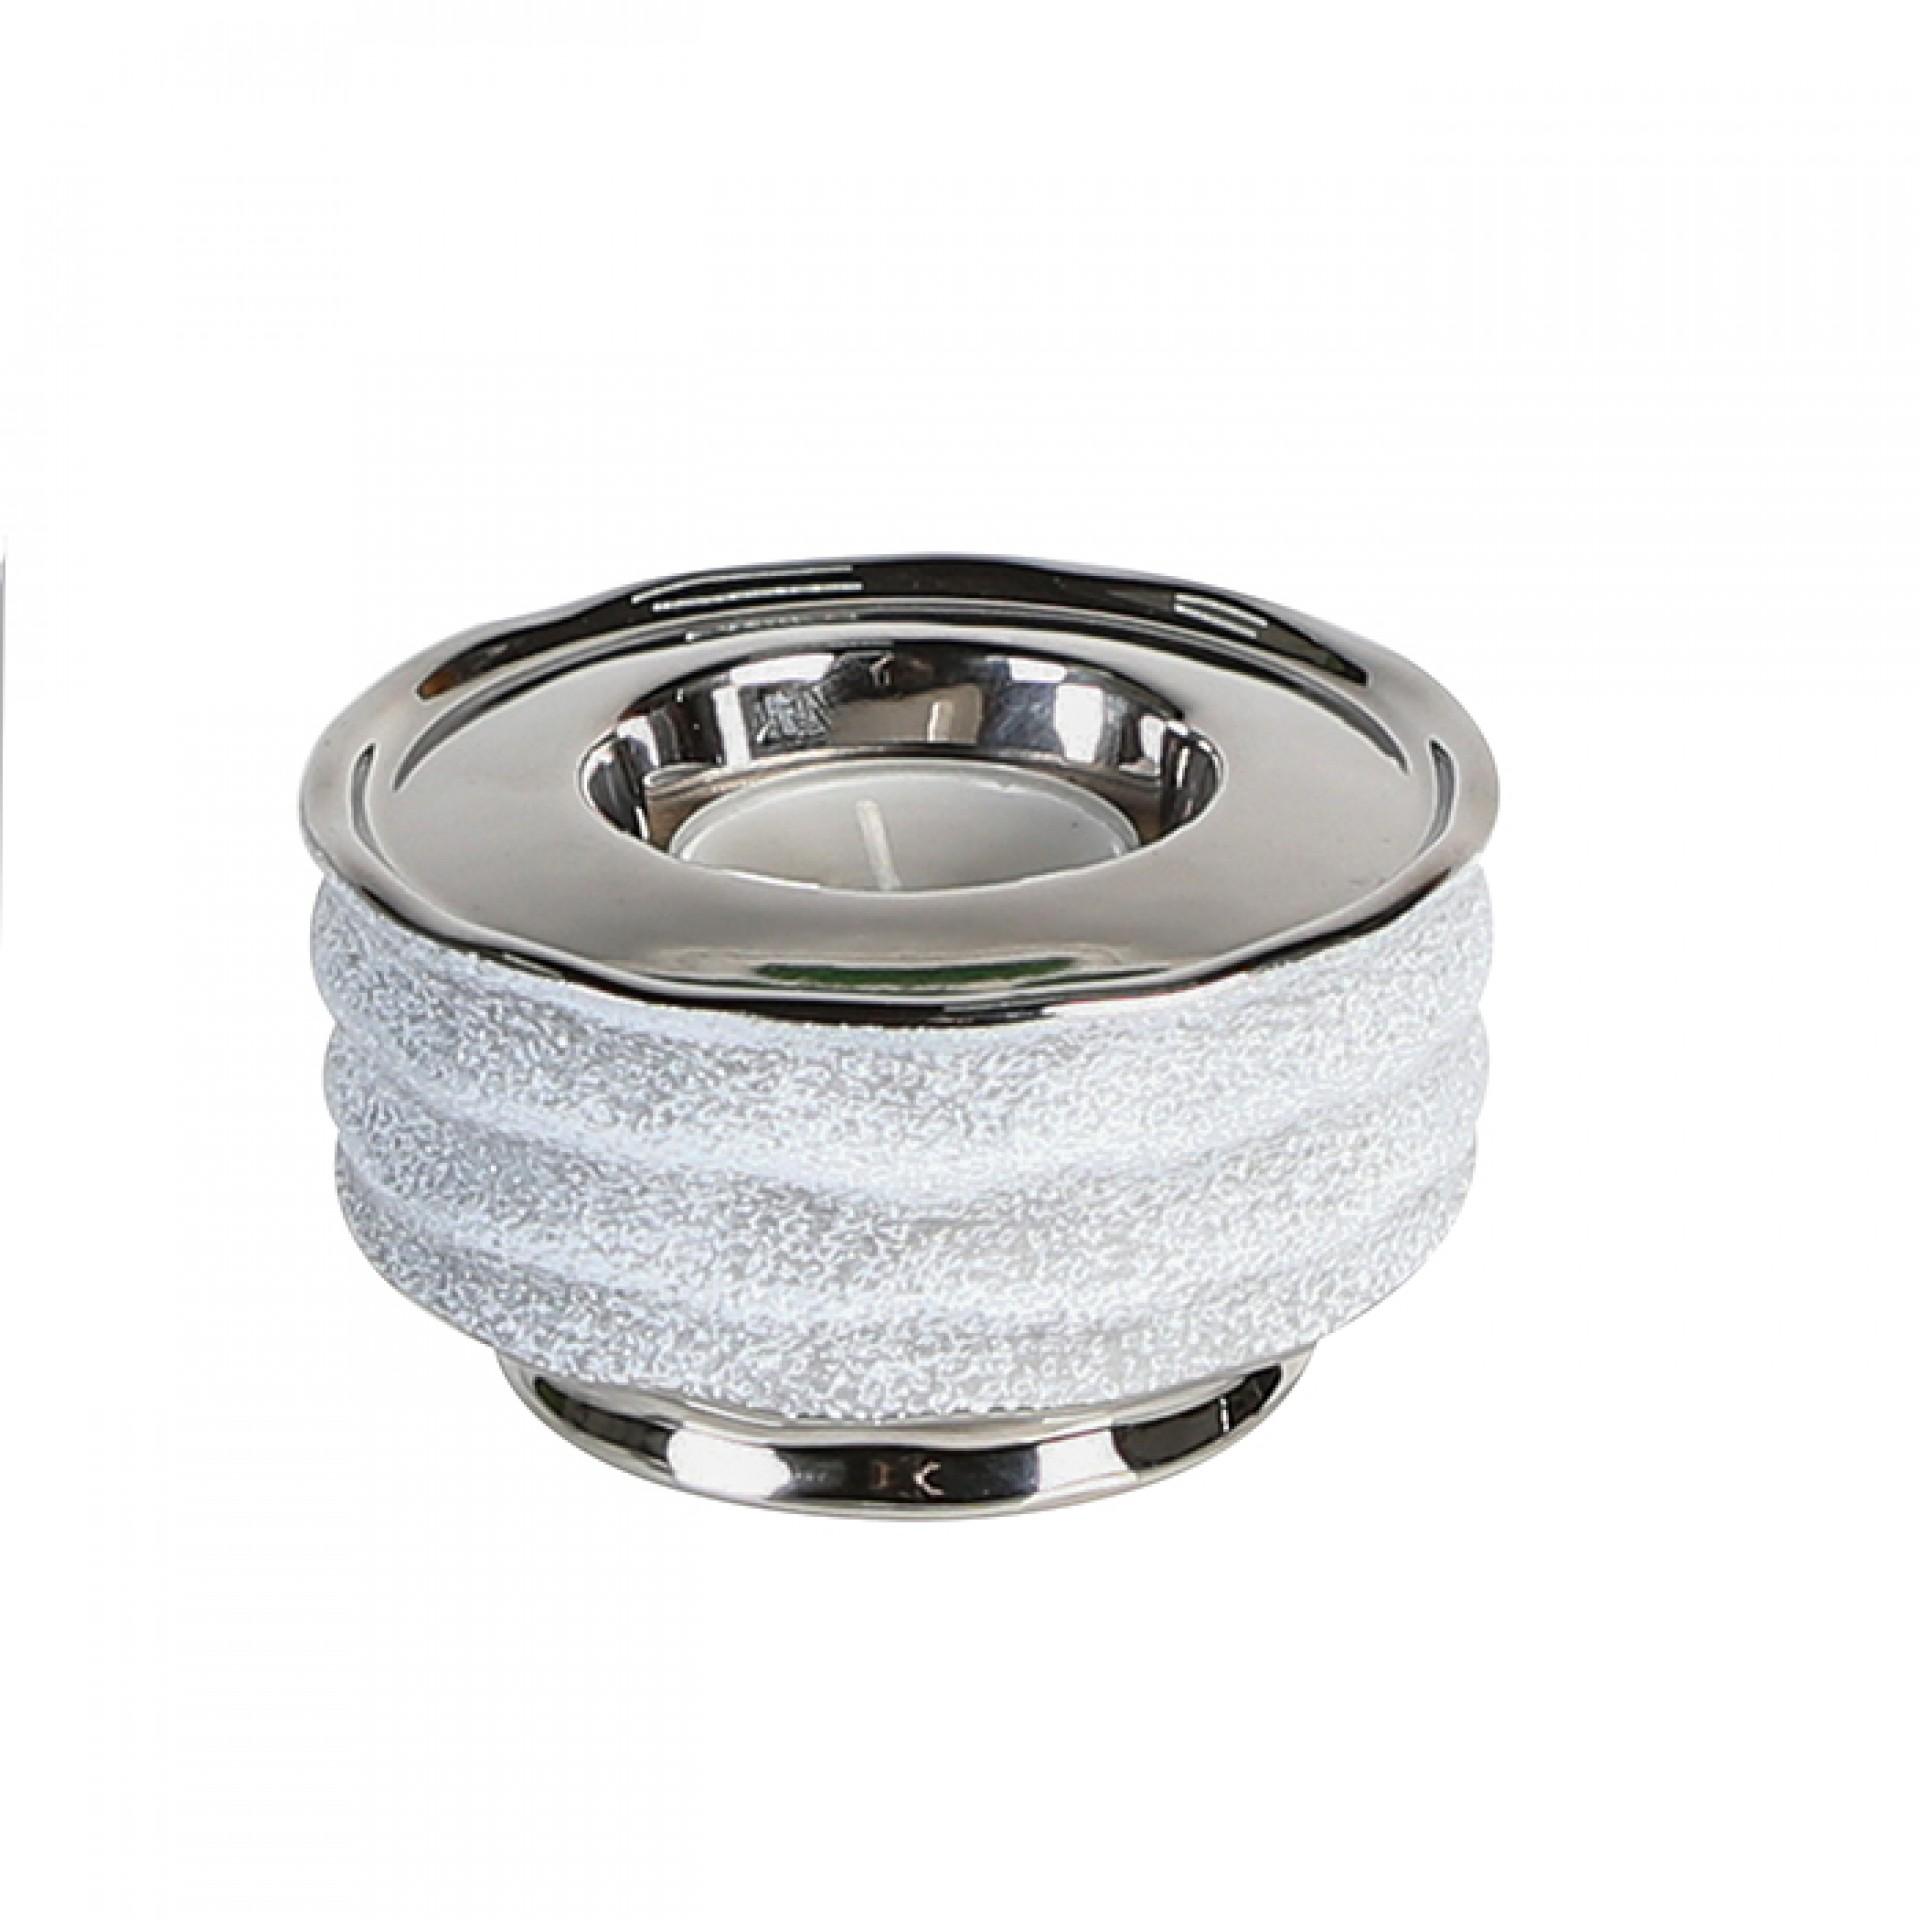 Keramický čajový svícen Wipe, 10 cm, stříbrná/šedá